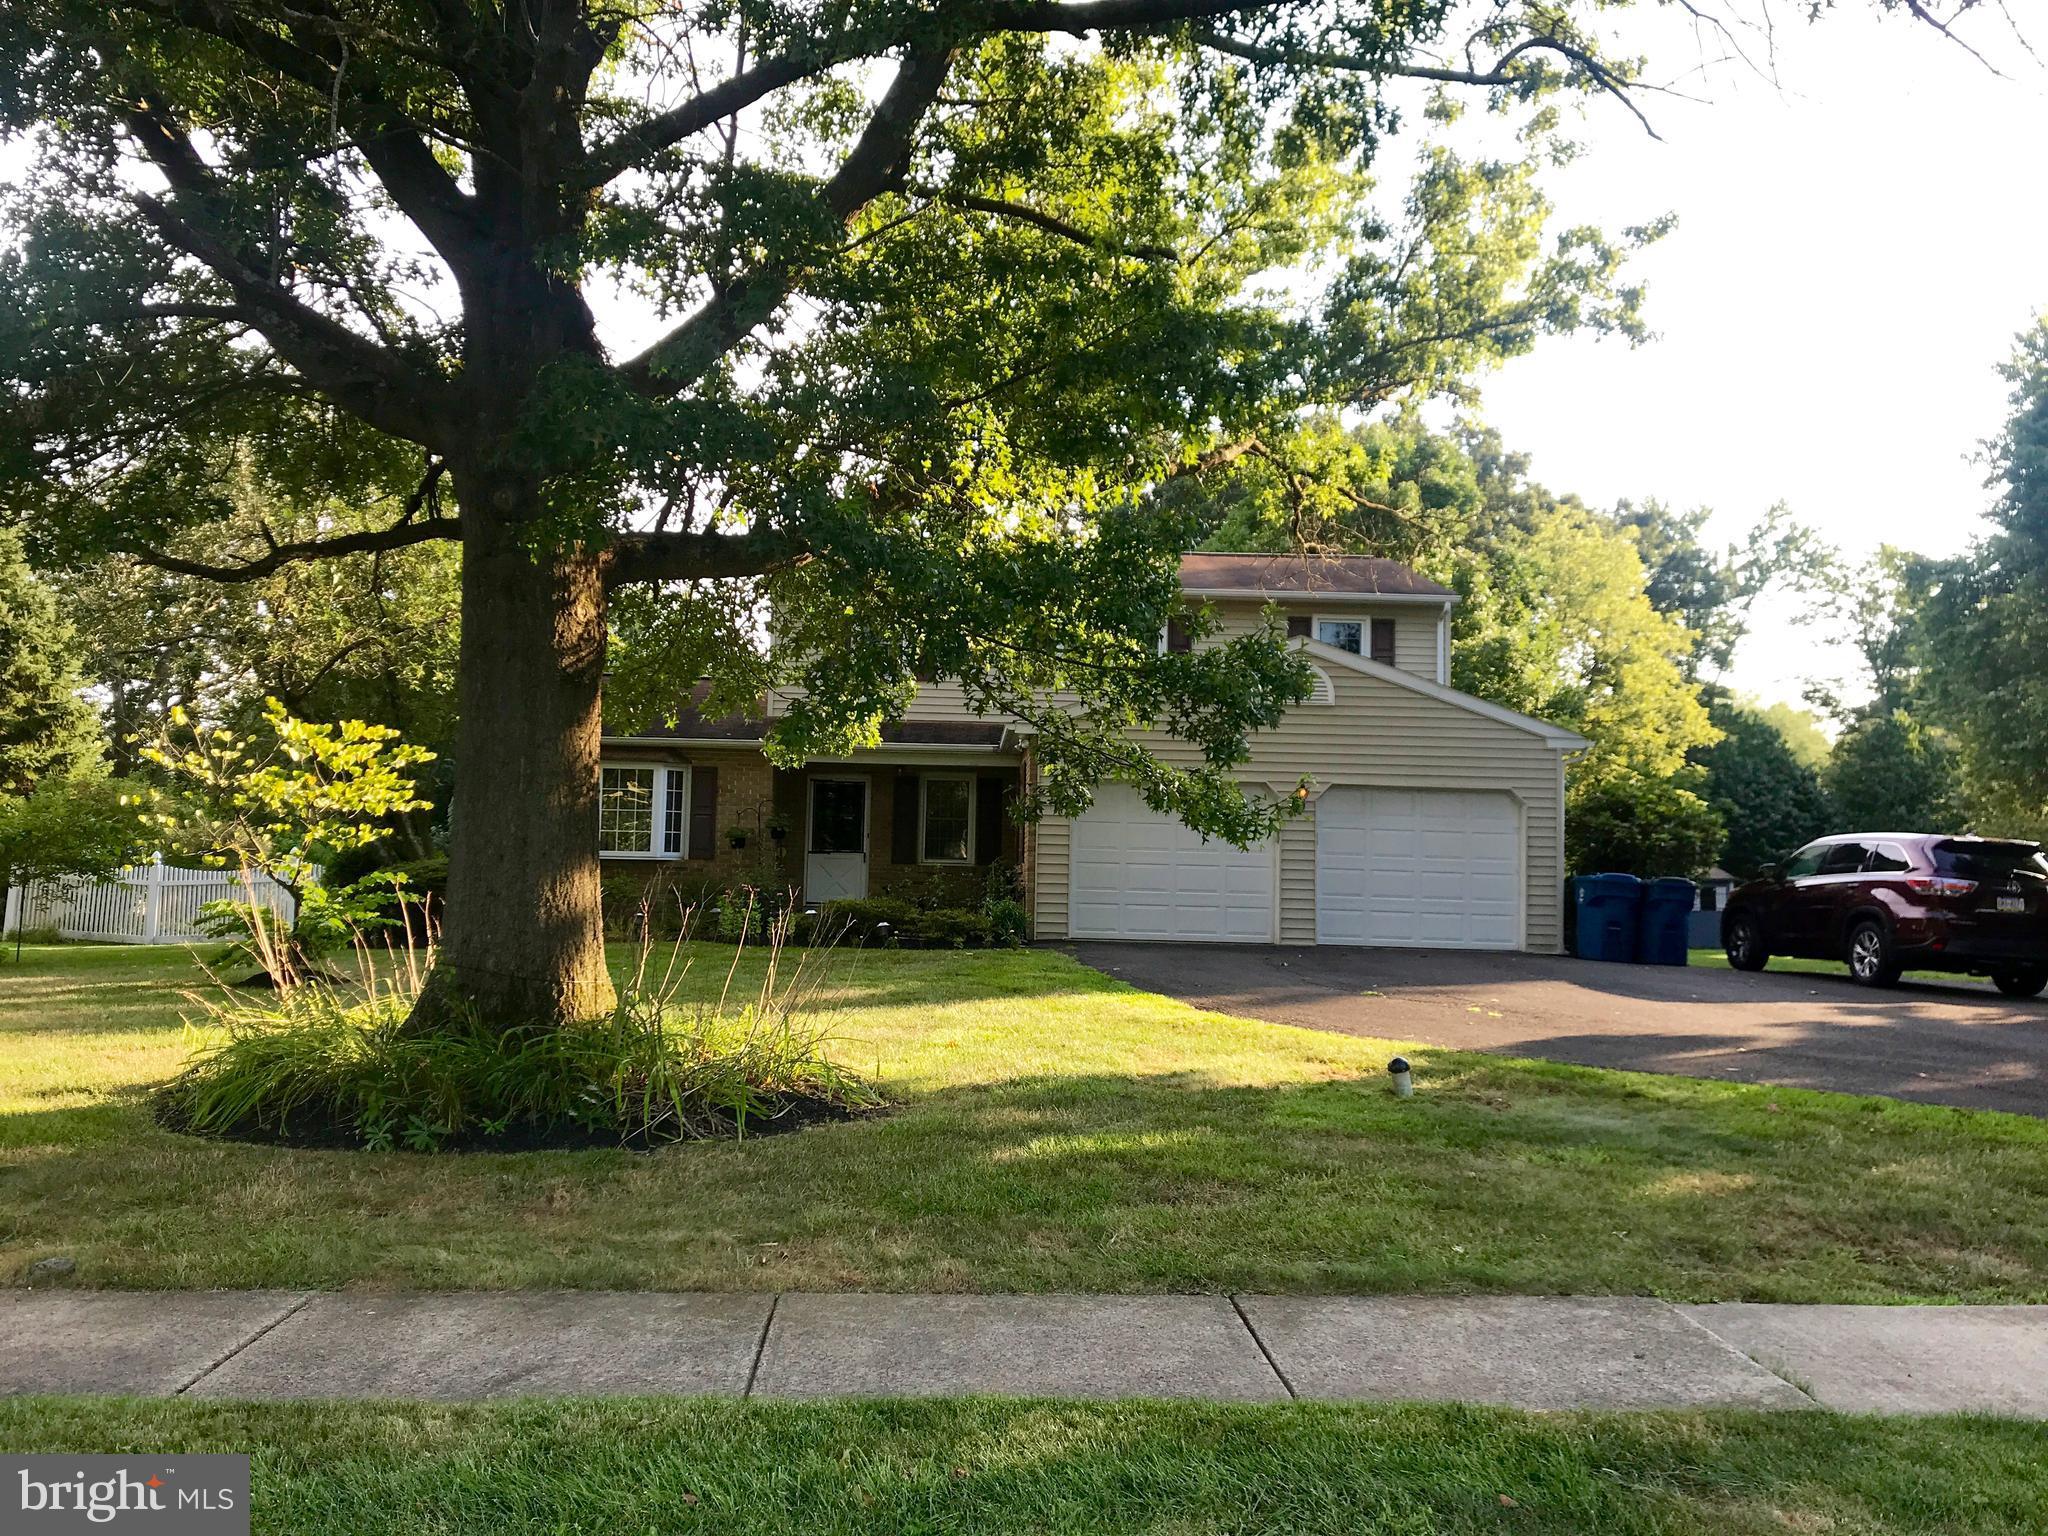 1514 West Lane, Hatfield, PA 19440